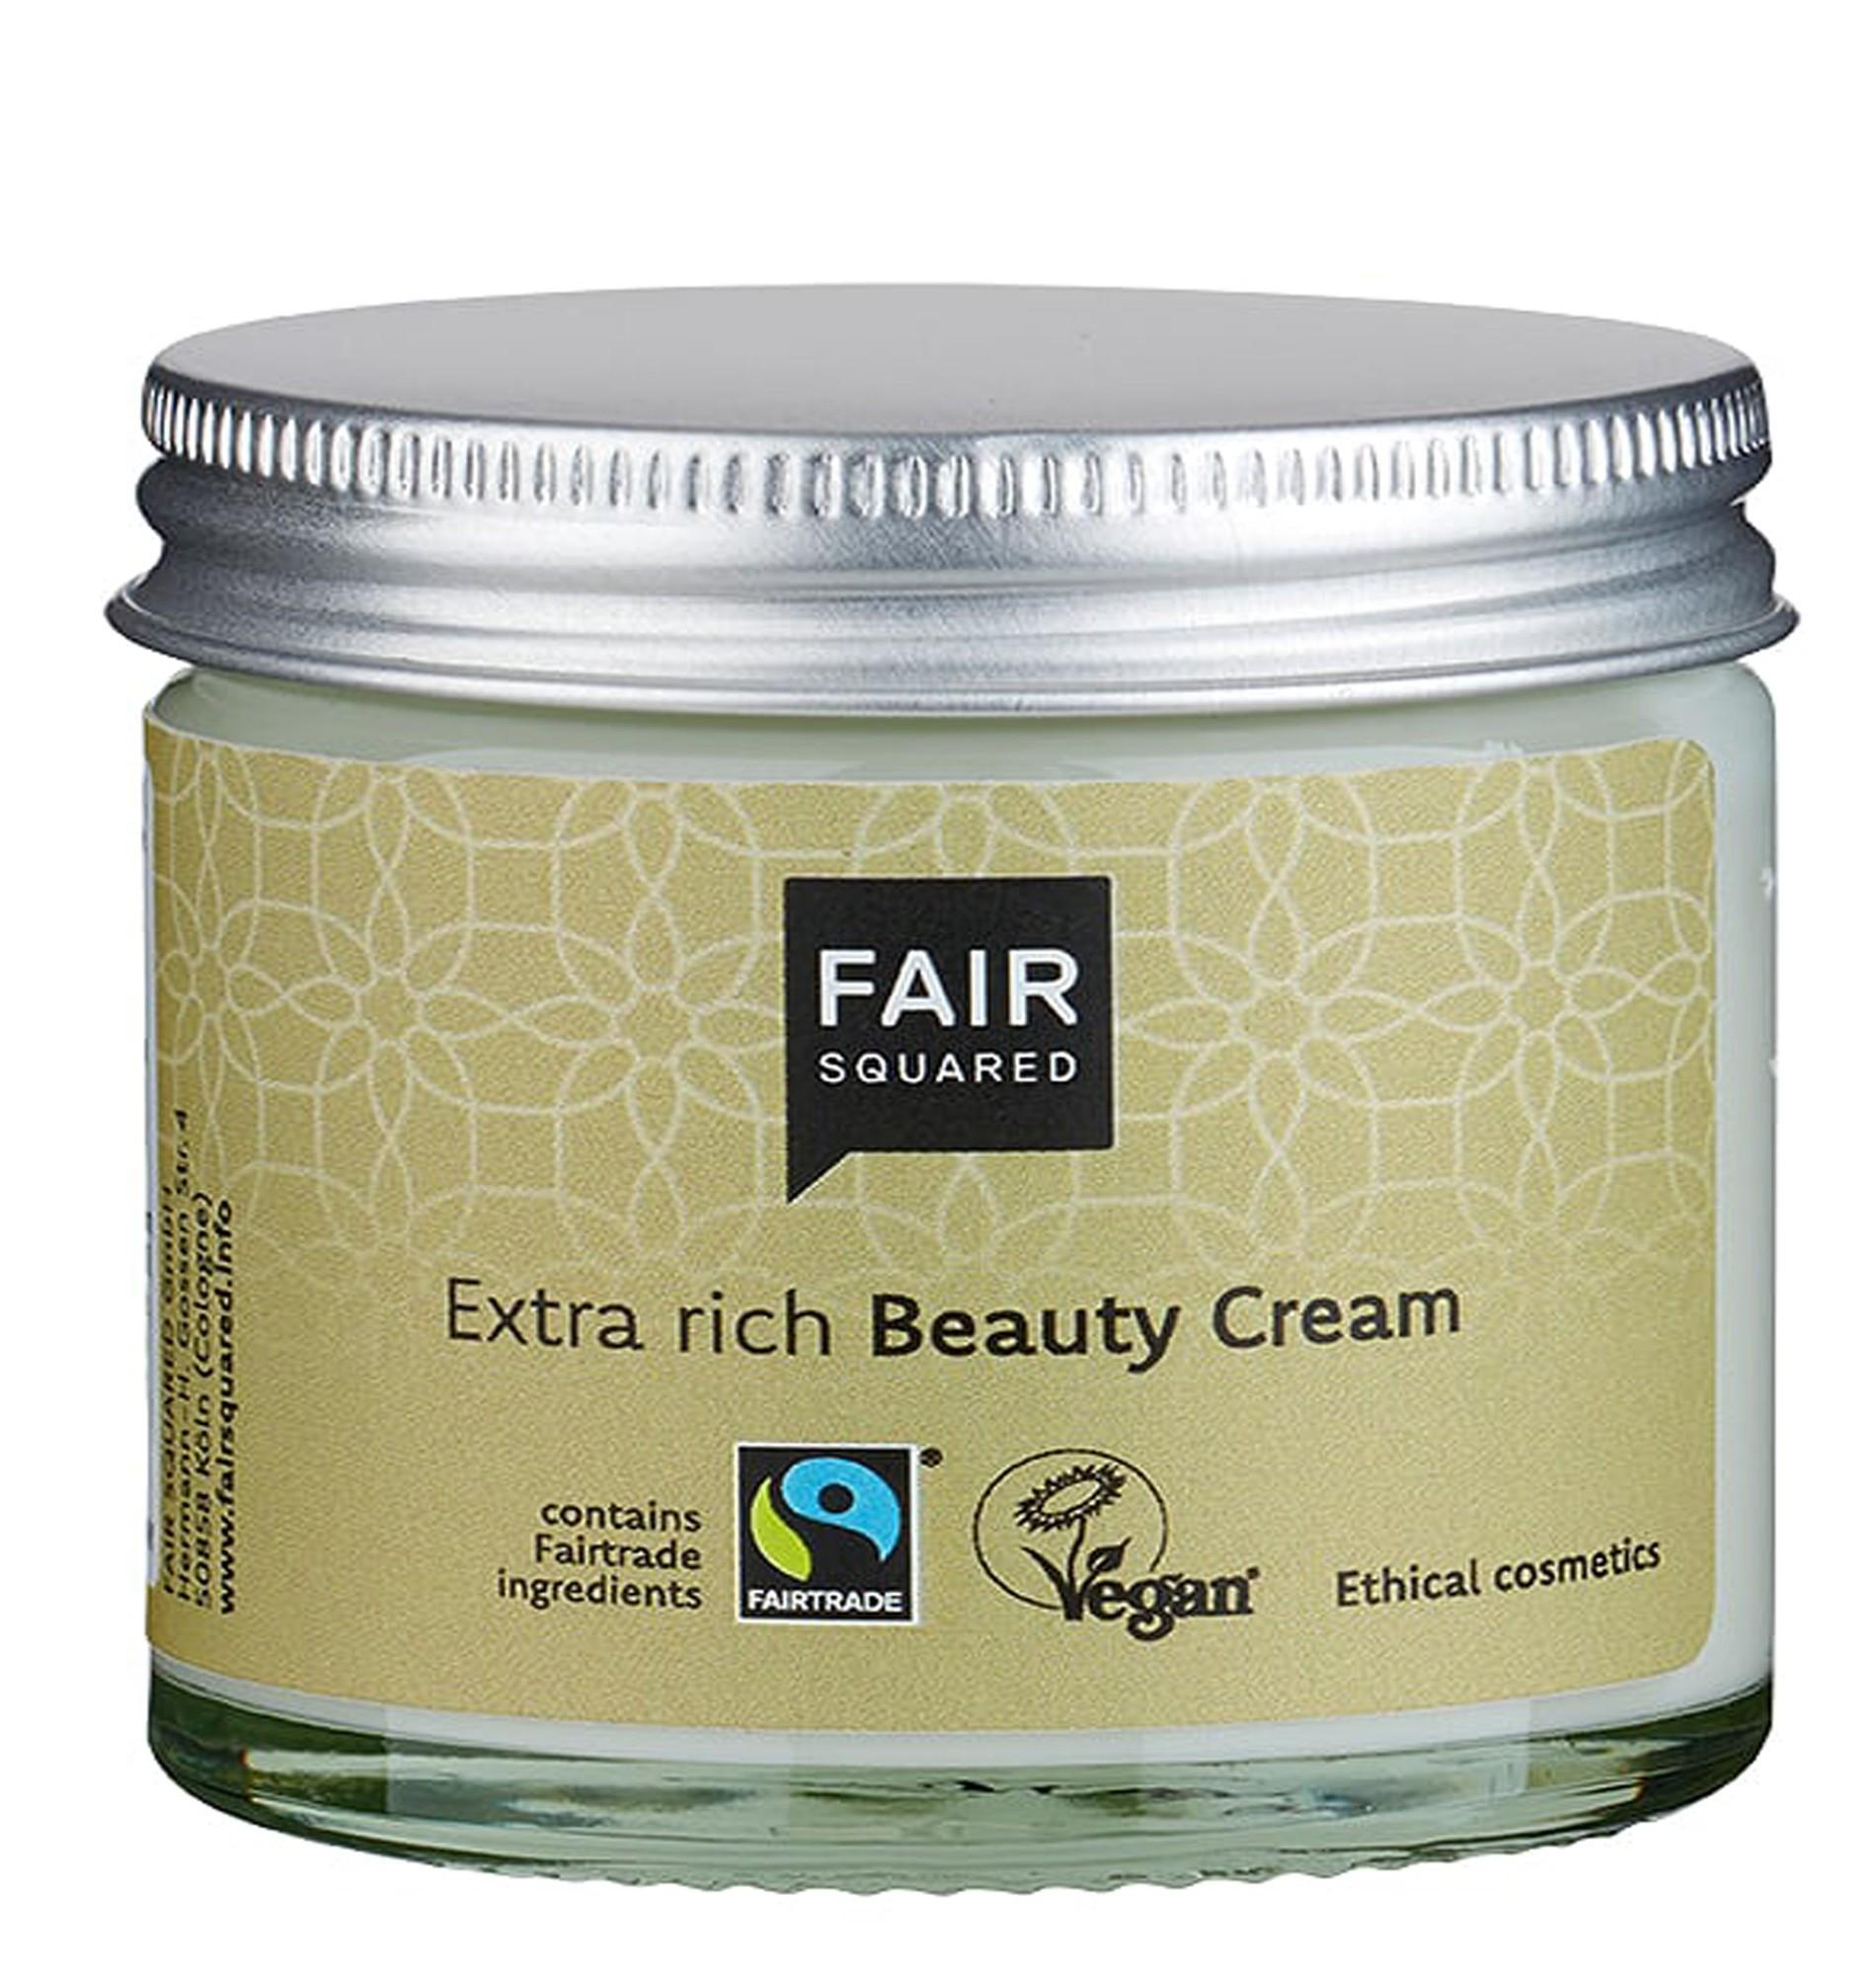 Fair Squared Extra Rich Beauty Cream